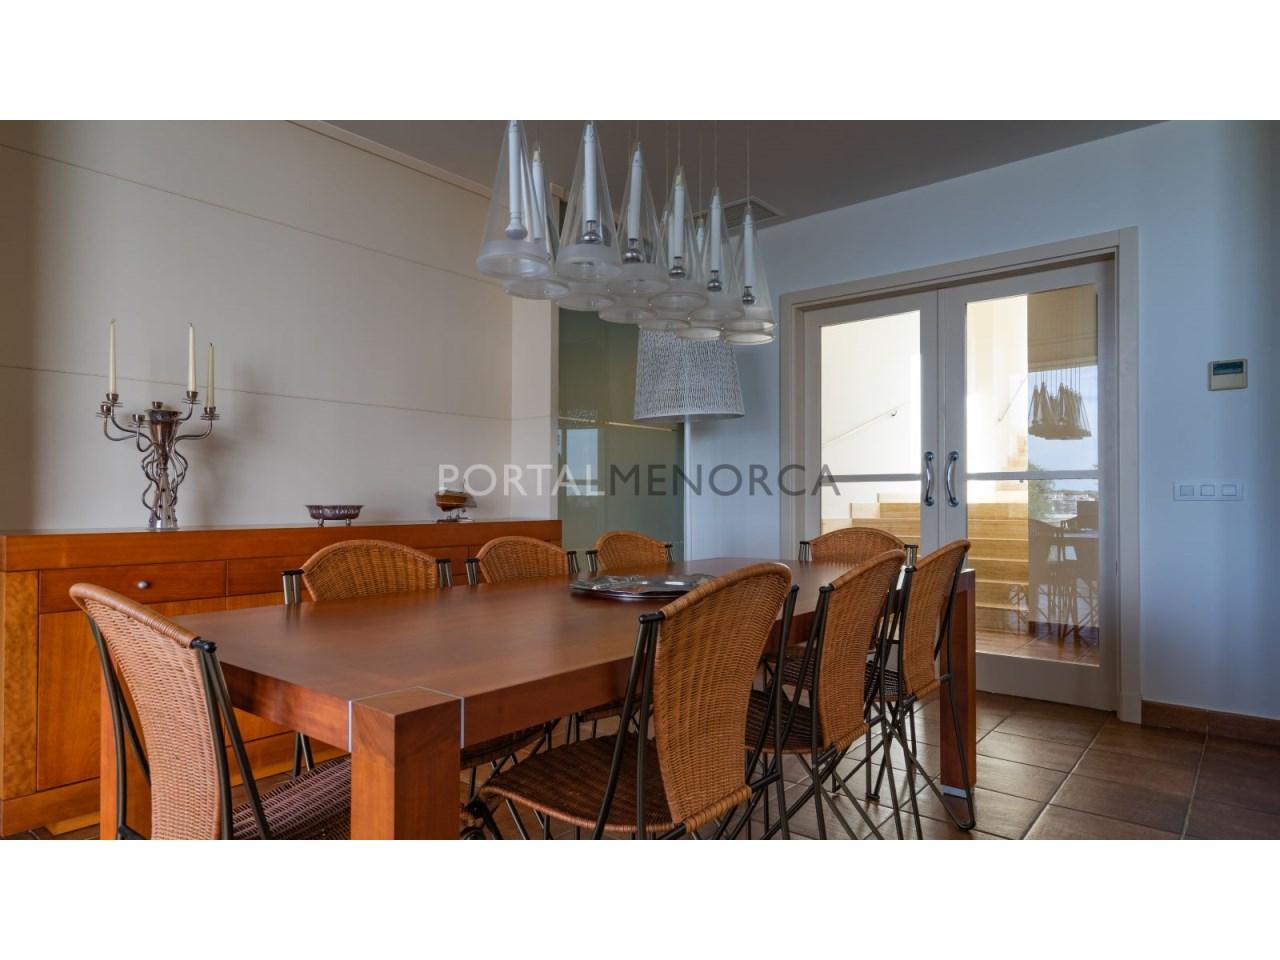 luxe-maison-vendre-acheter-menorca (5)